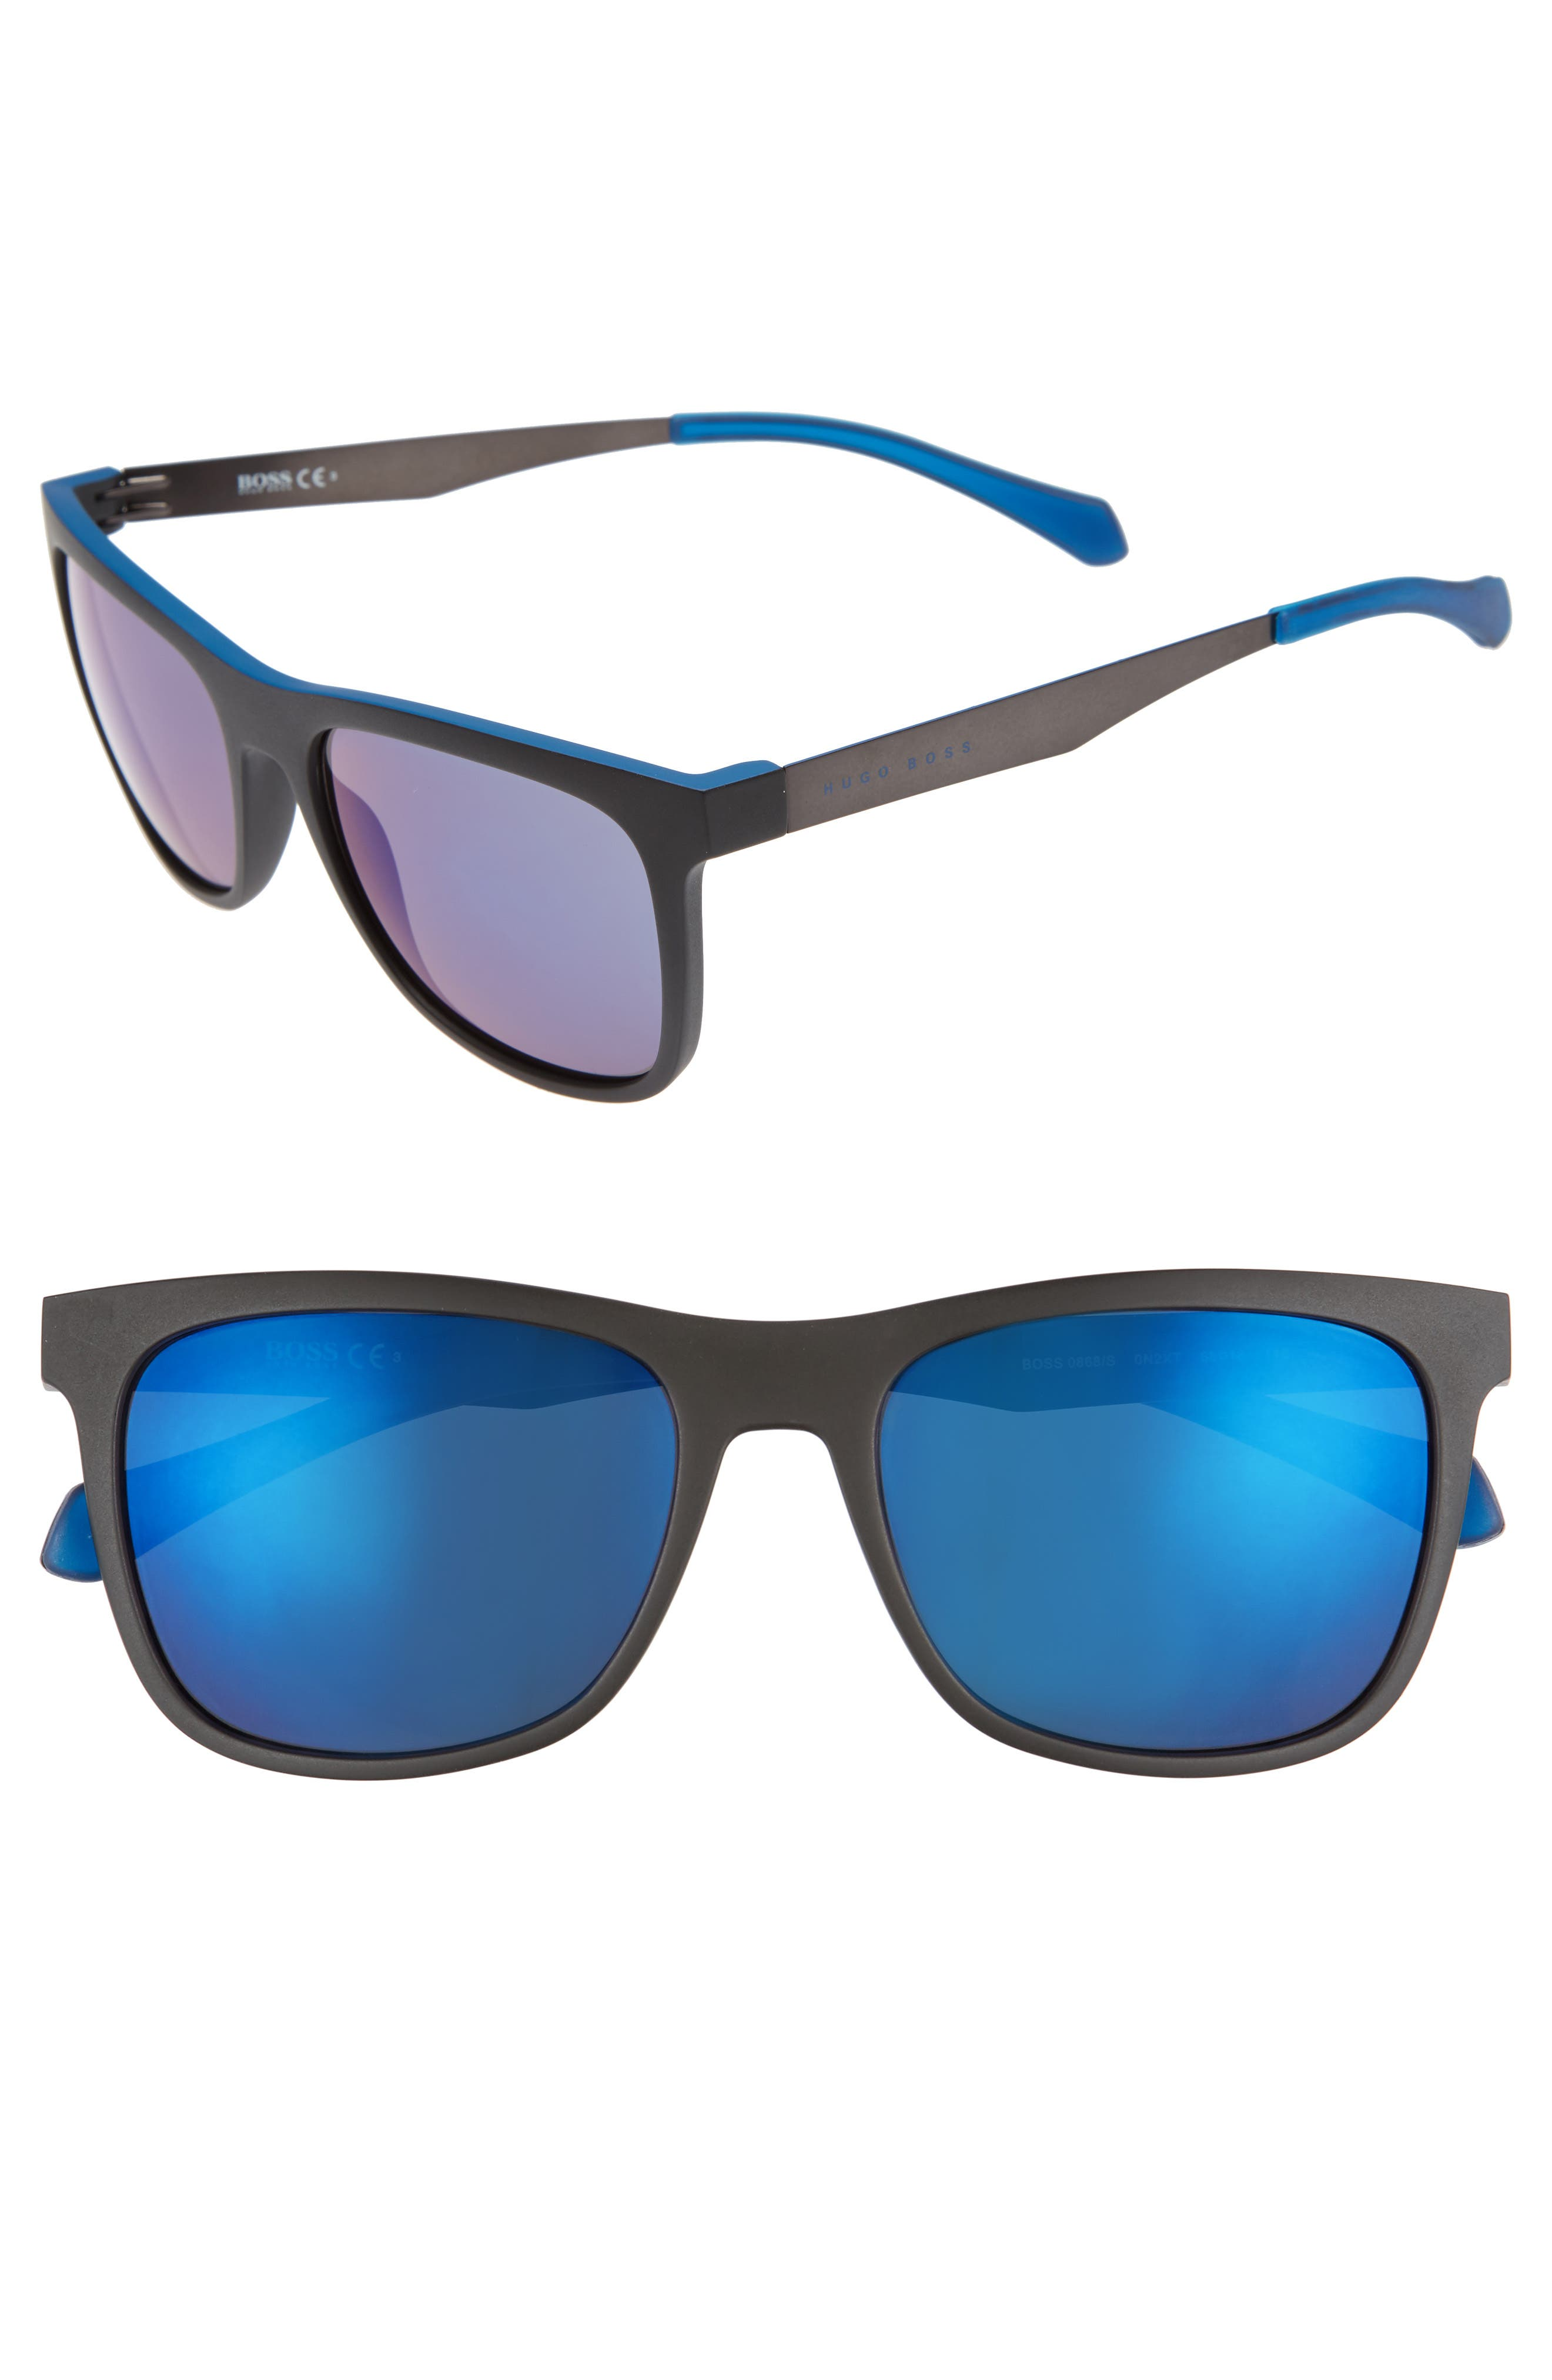 Main Image - BOSS 55mm Sunglasses